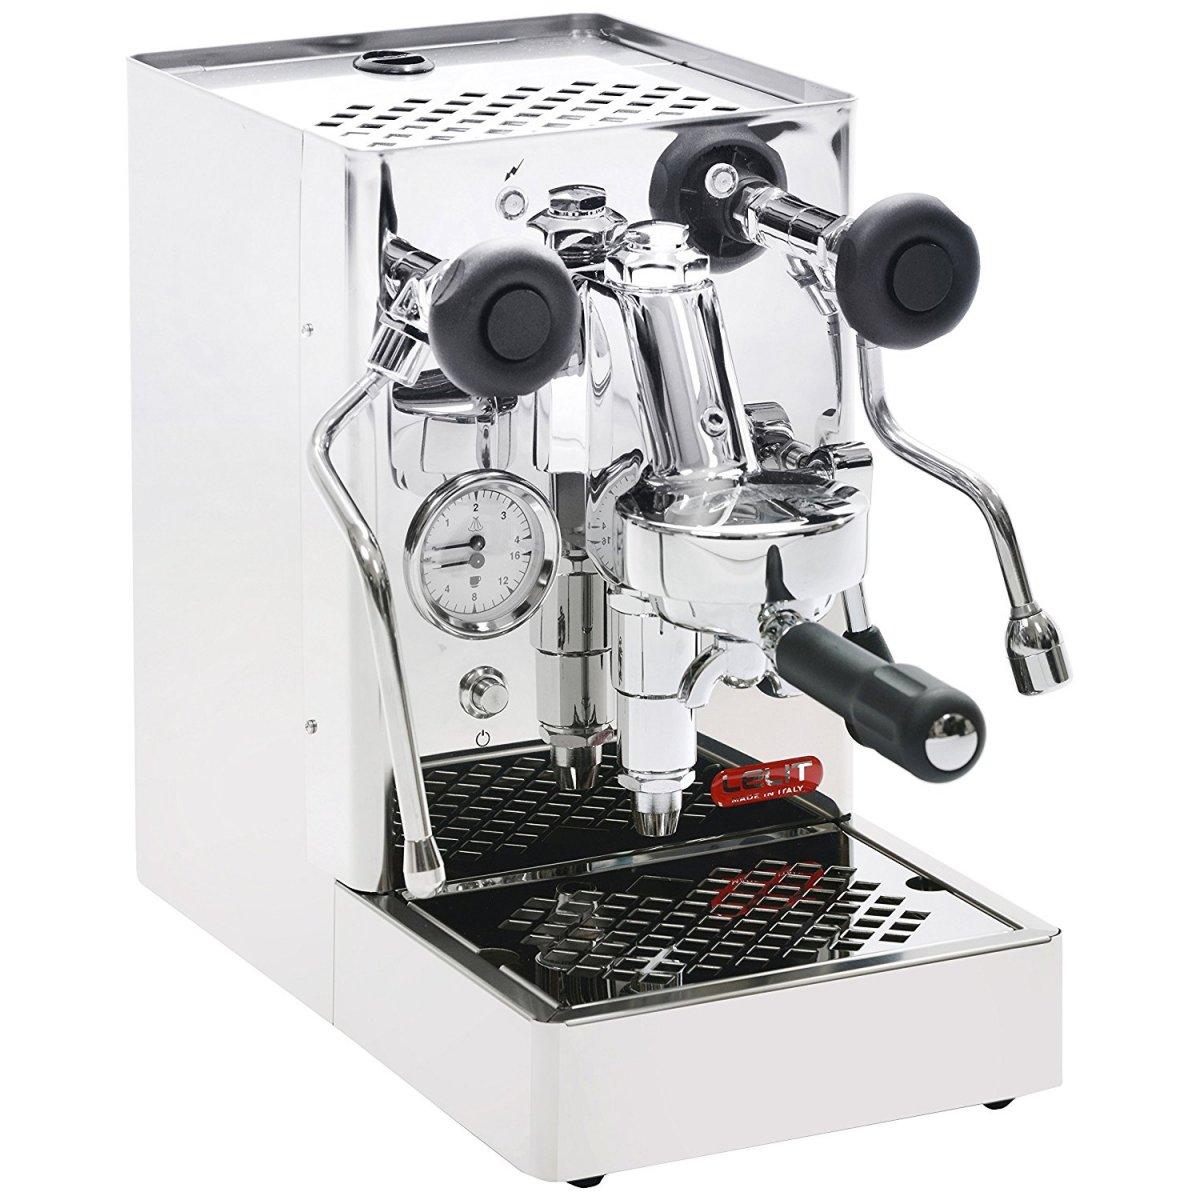 LELIT MARA PL62S MACCHINA CAFFÈ LELIT